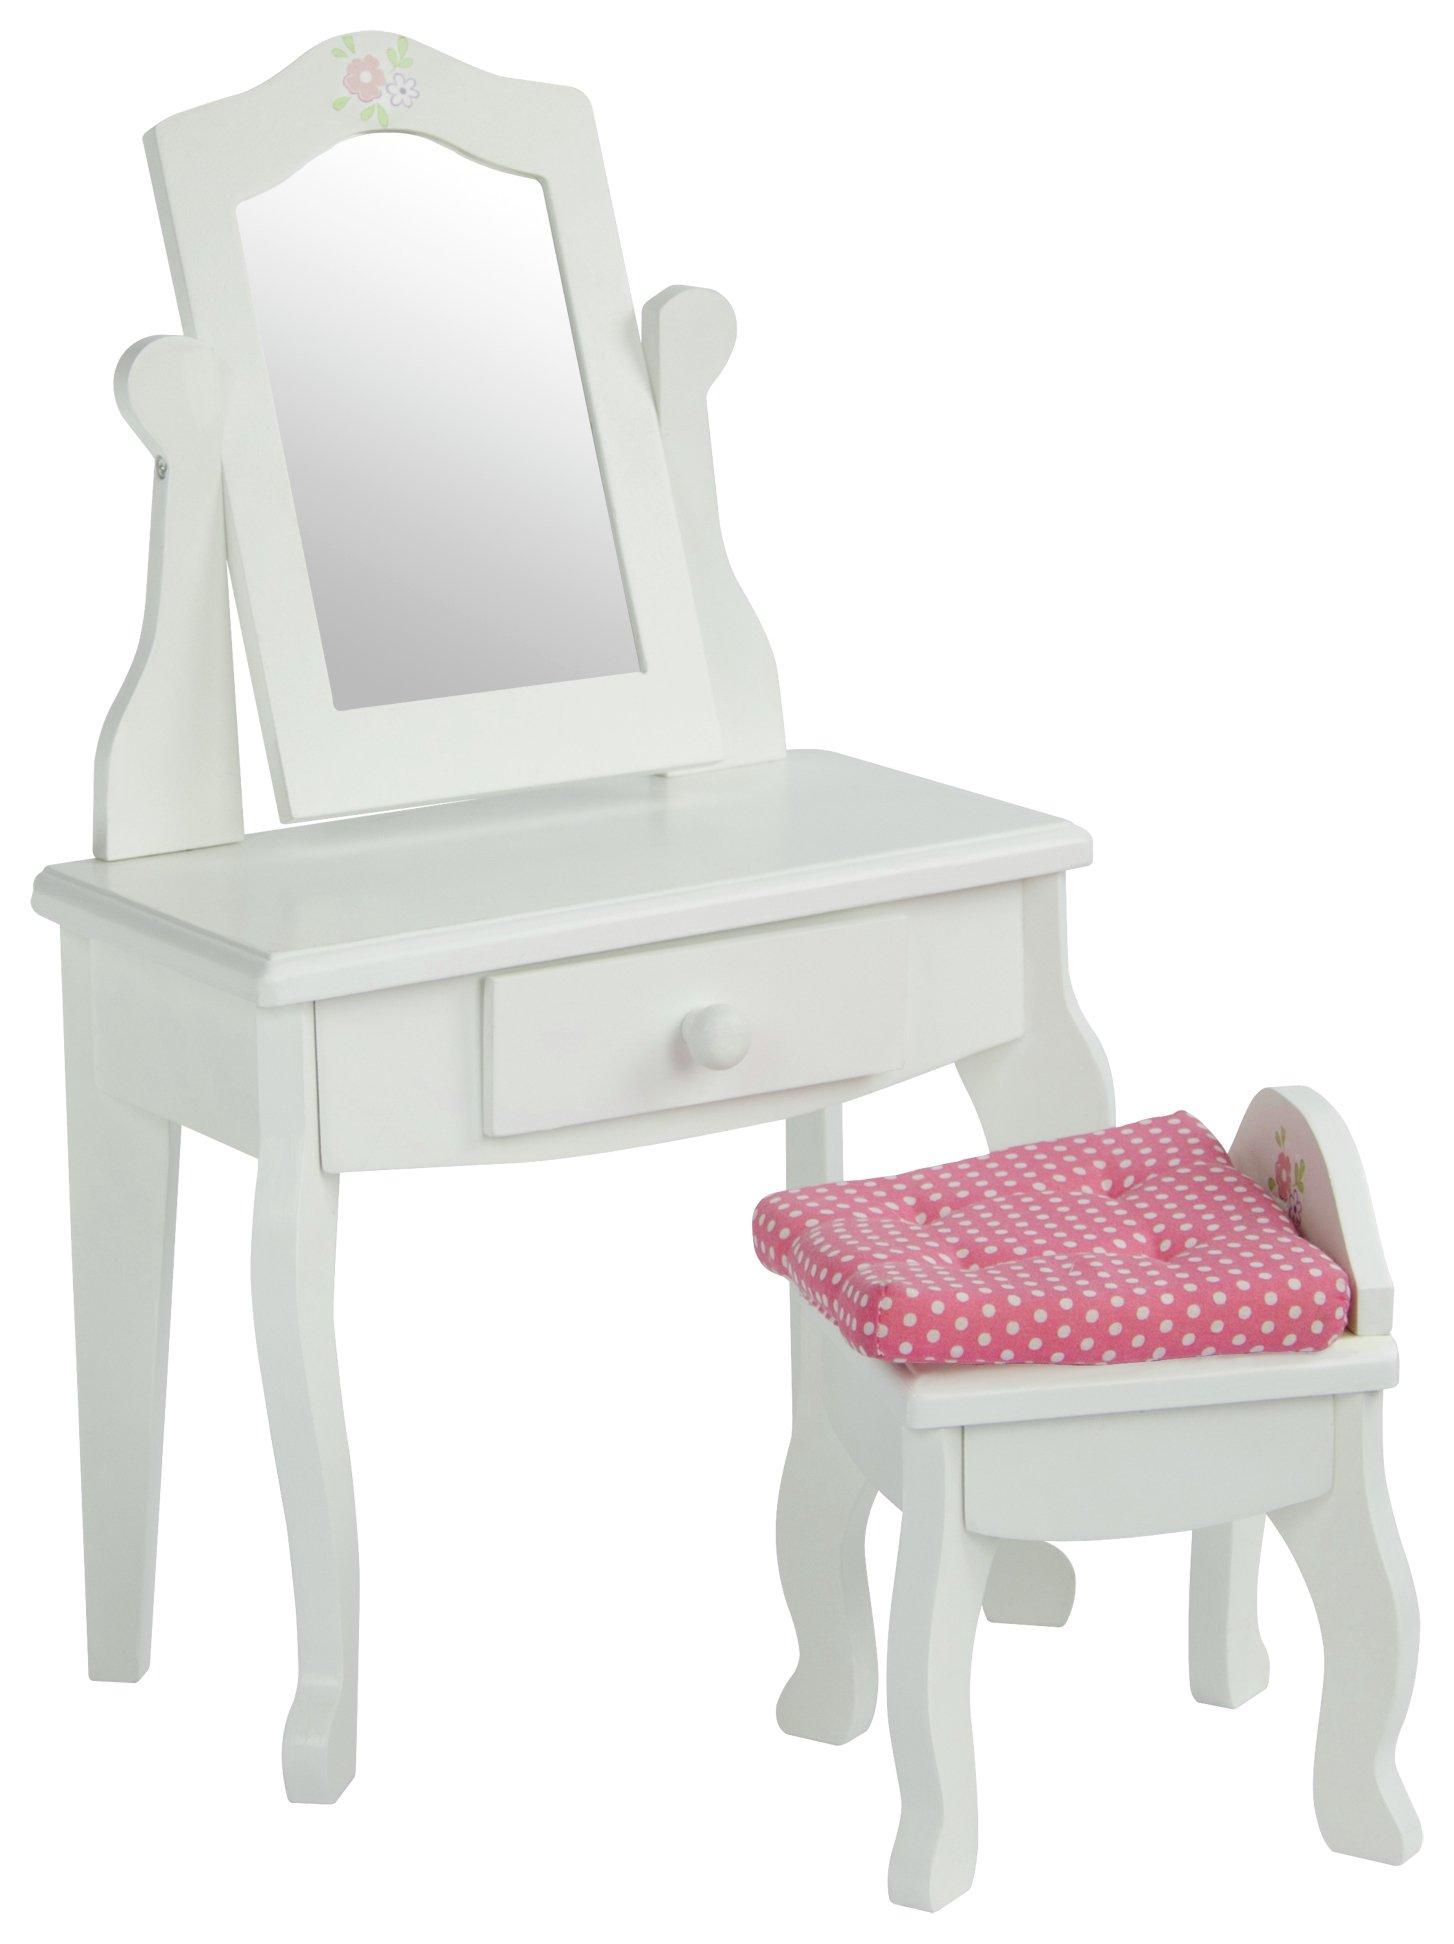 Olivia's Little World Little Princess Doll Vanity Table - White